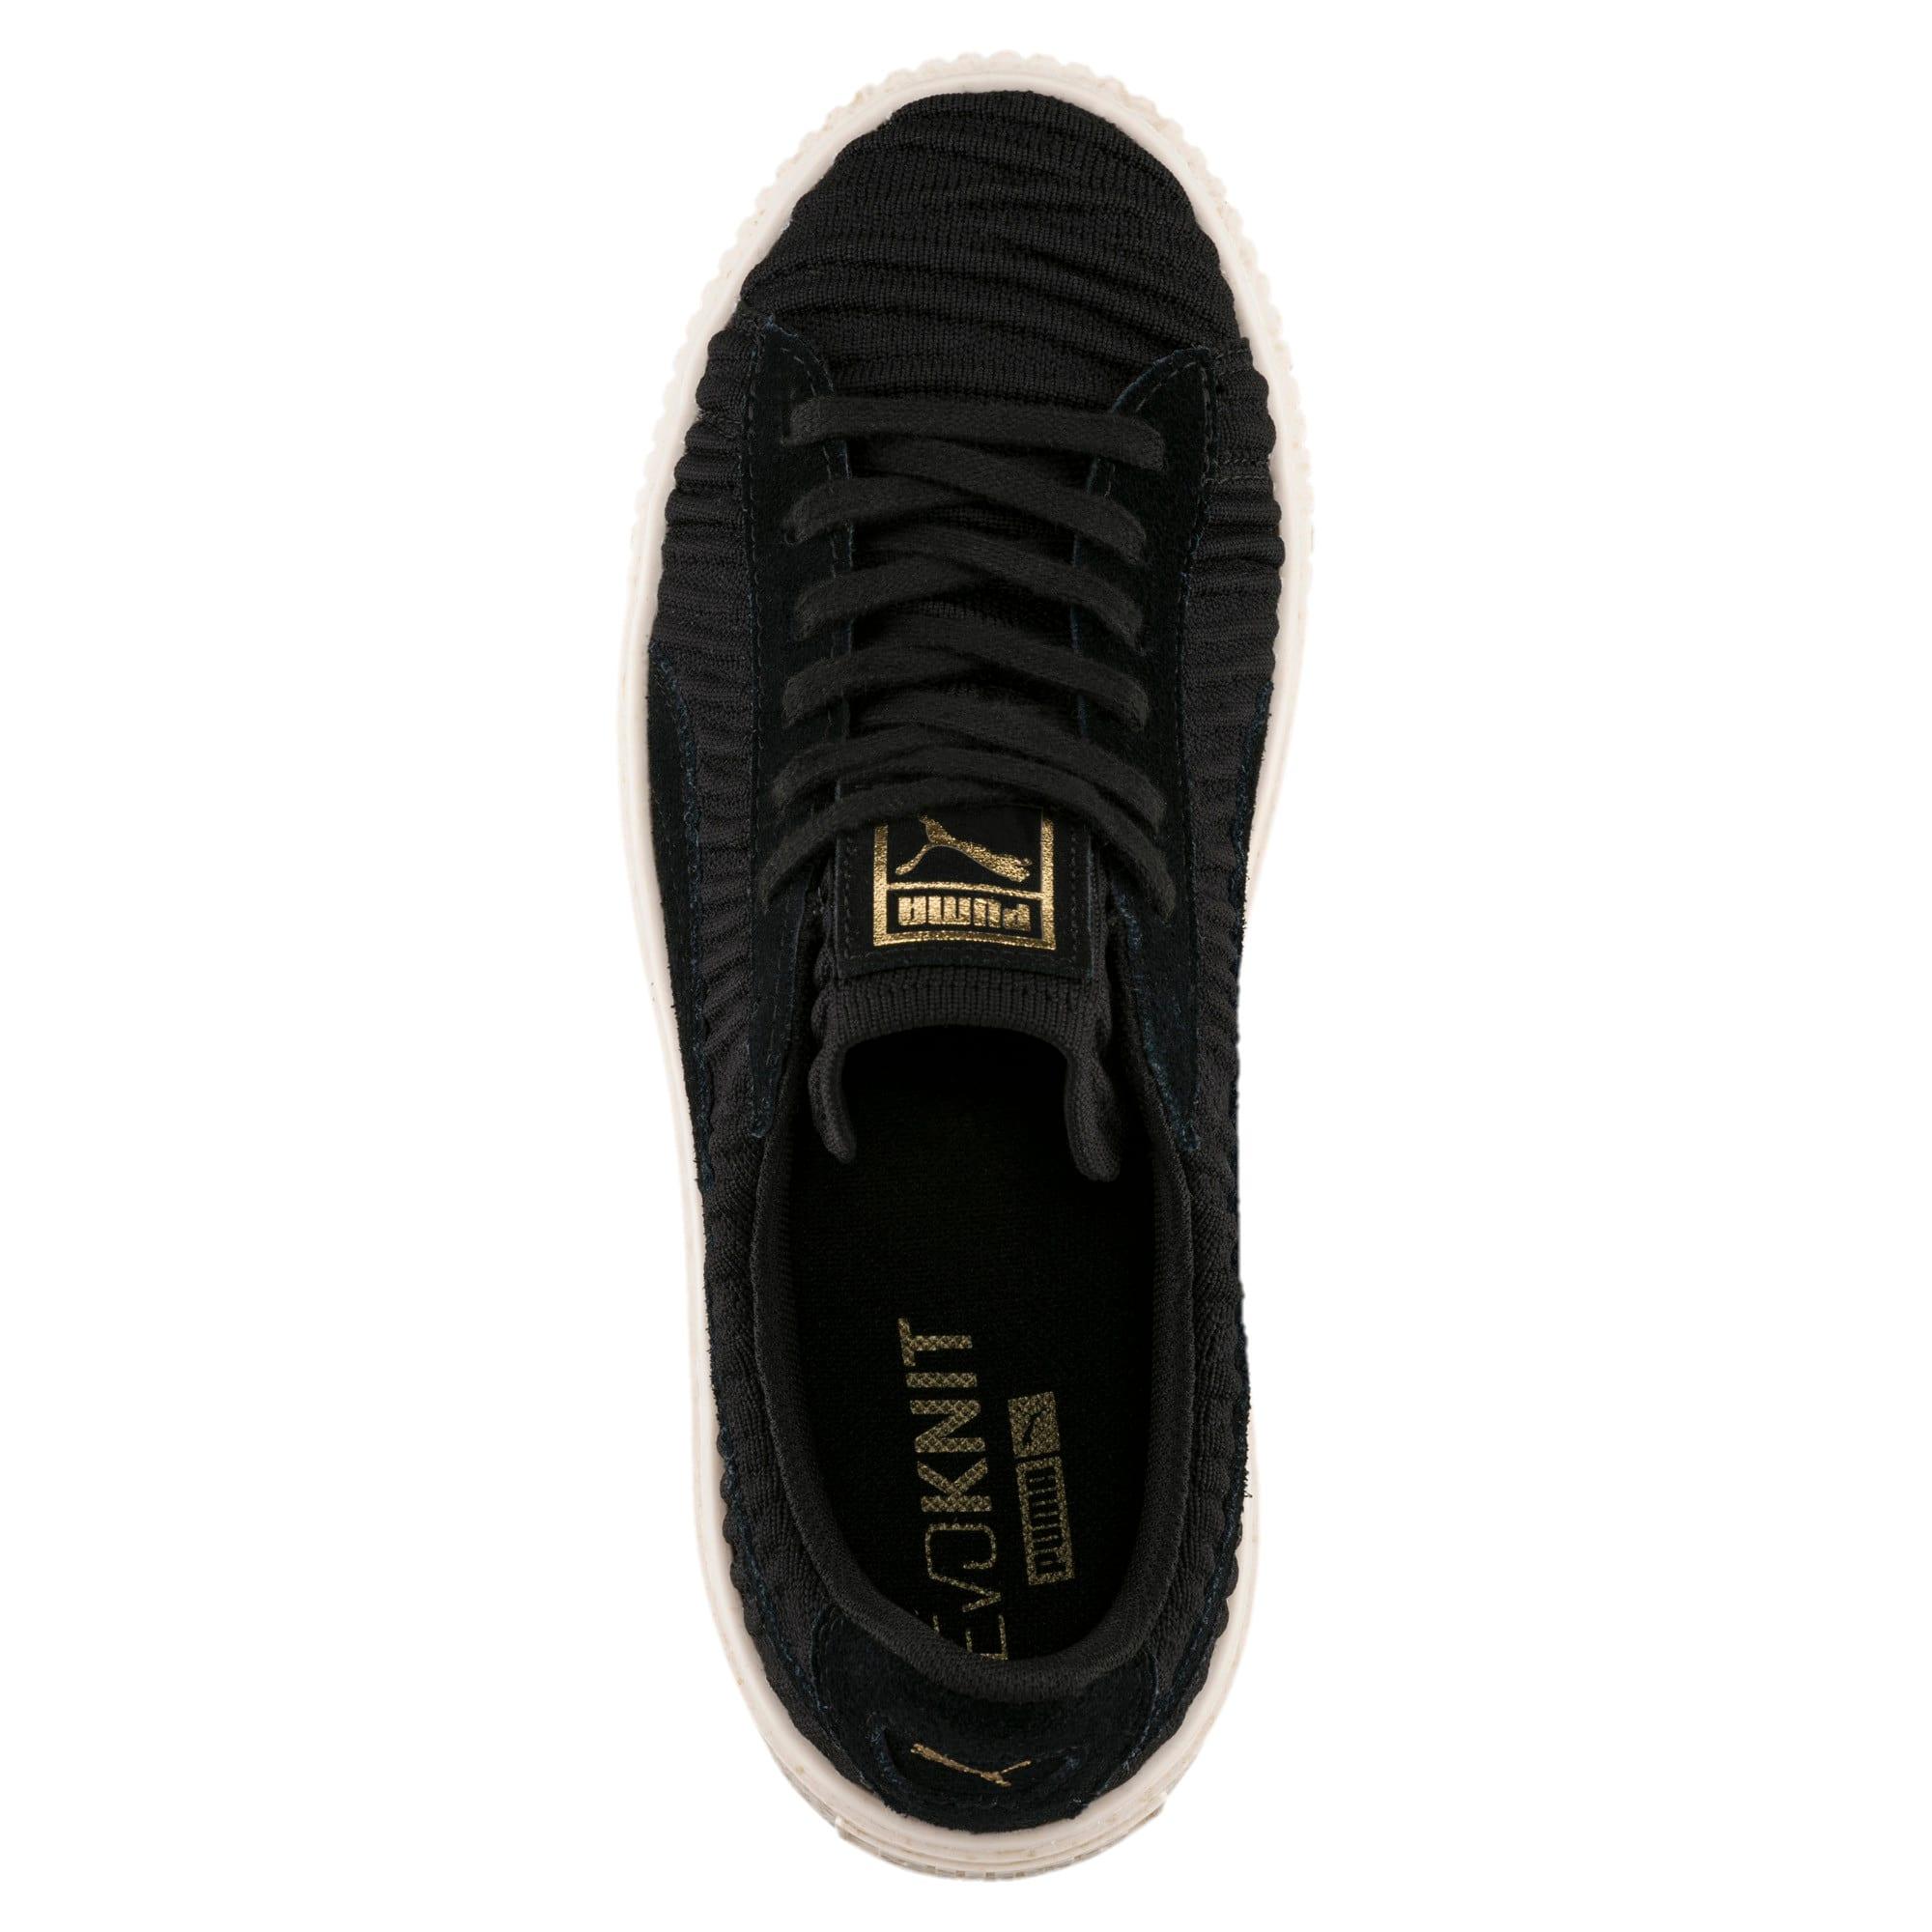 Thumbnail 5 of Basket Platform Women's Sneakers, PBlack-PBlack-Whisper White, medium